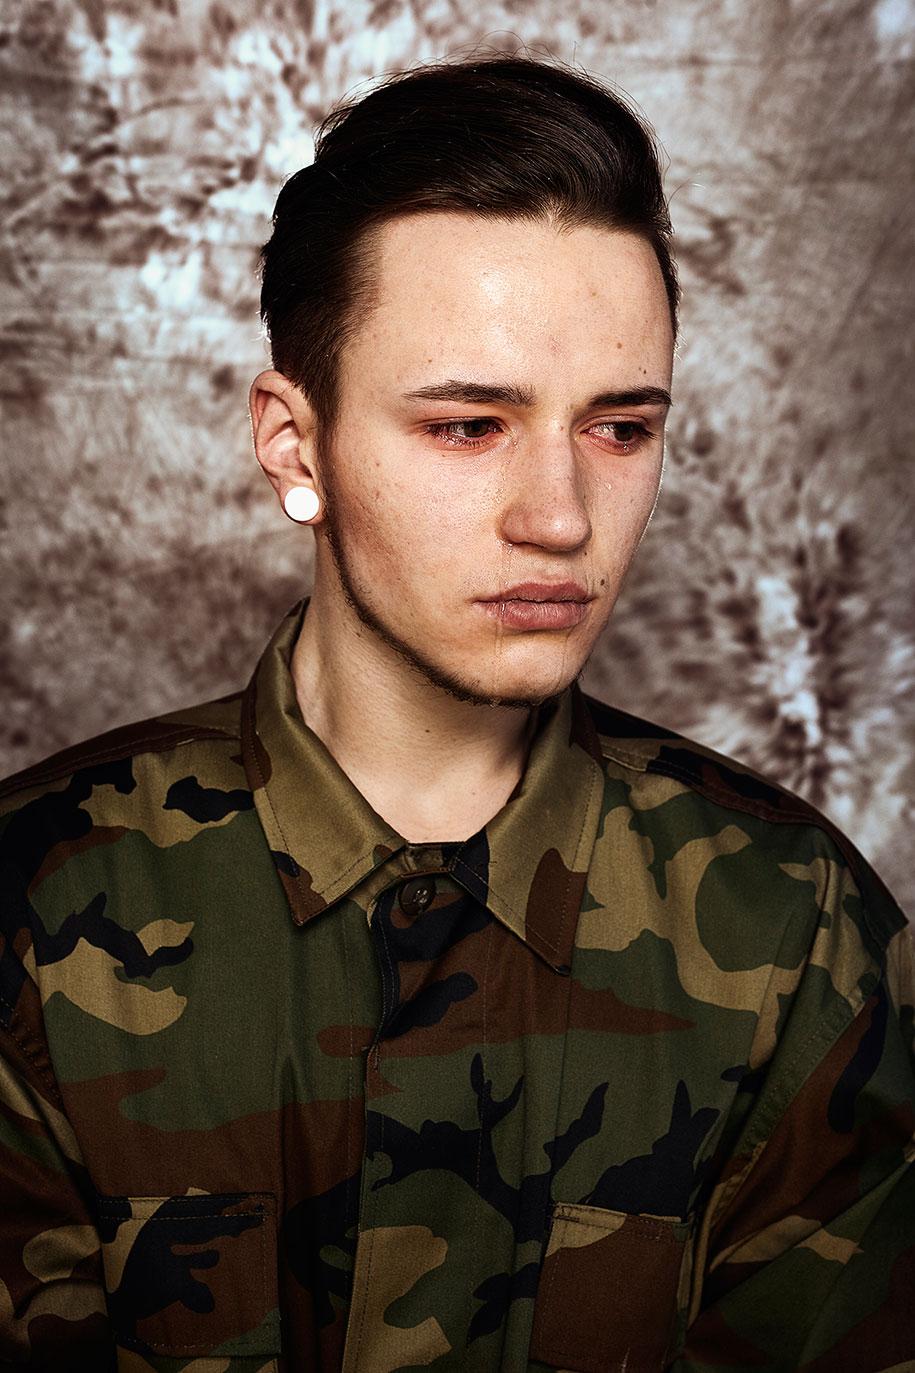 lithuanian-draft-conscription-men-portraits-neringa-rekasiute-beata-tiskevic-hasanova-4